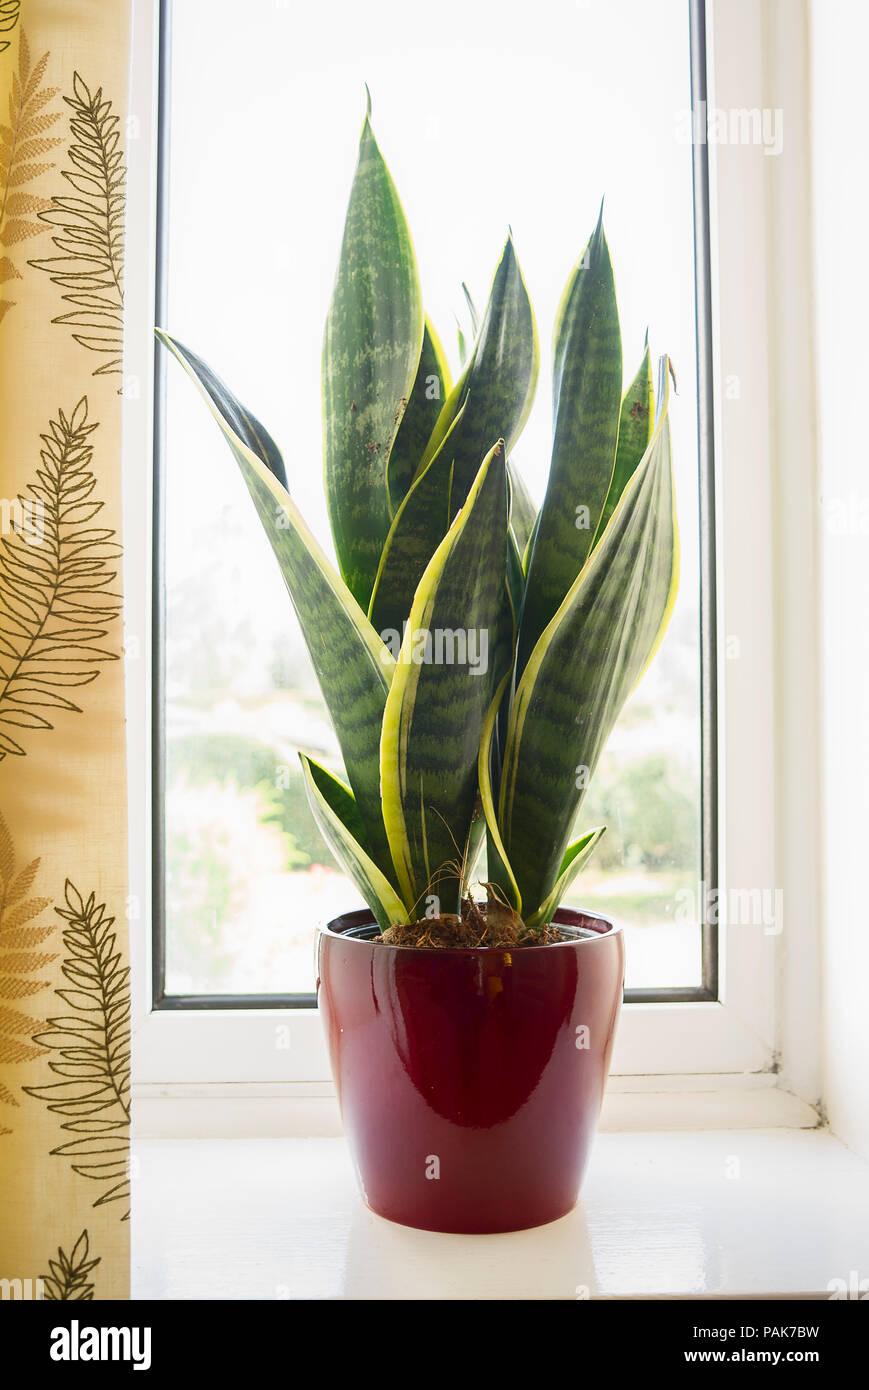 Sansevieria trifasciata Futura Superba; a decorative house plant in a red pot in UK - Stock Image